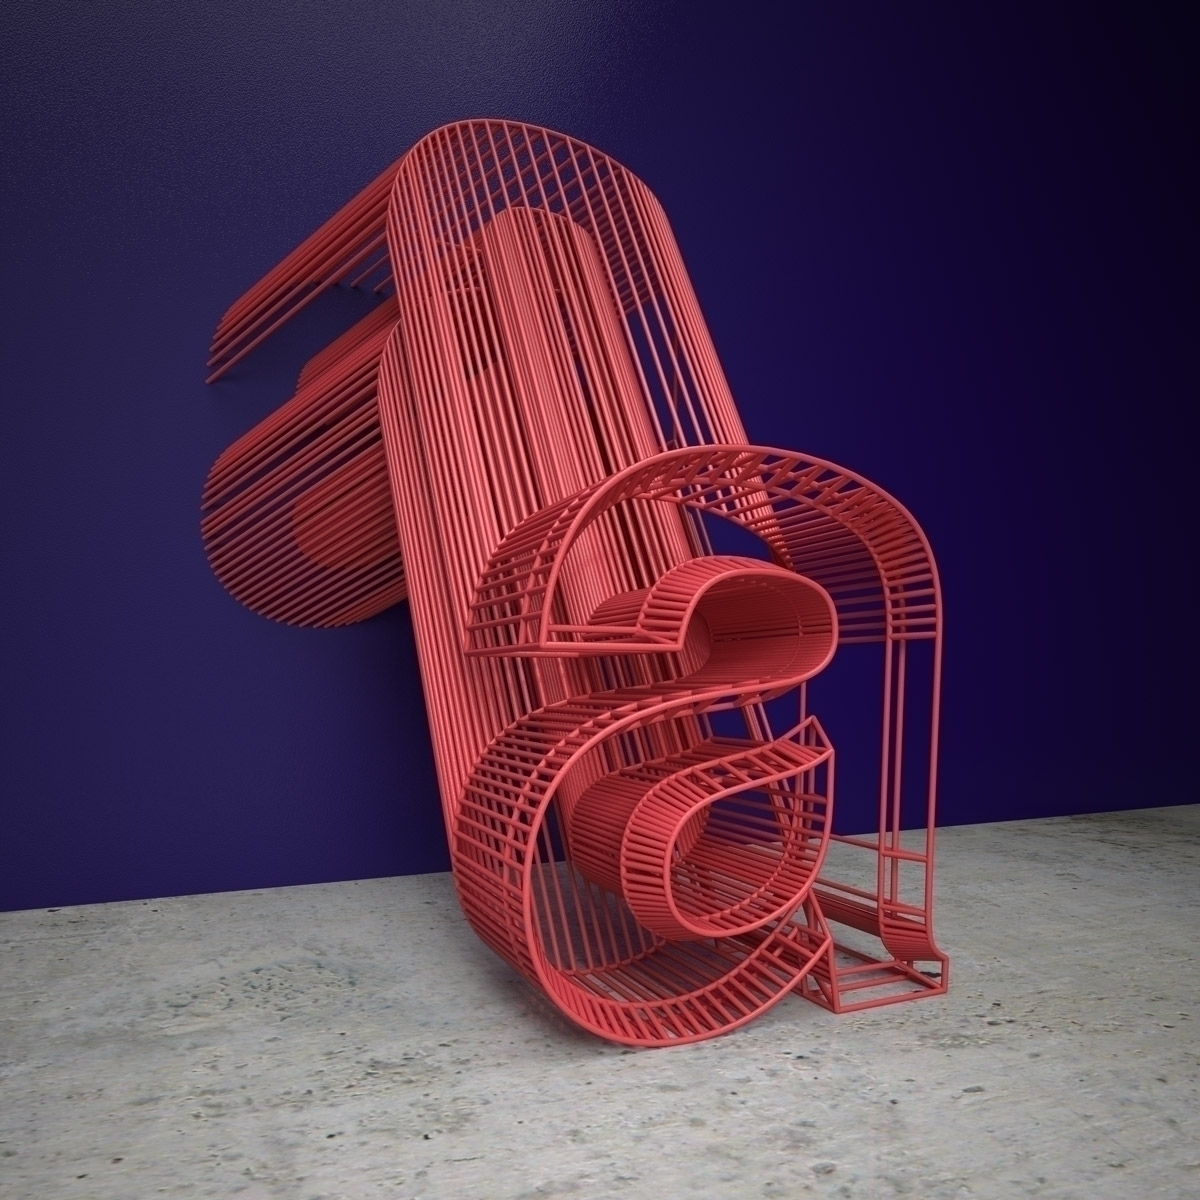 Glitches Wire - Glitch, Typography - aaaronkaufman | ello